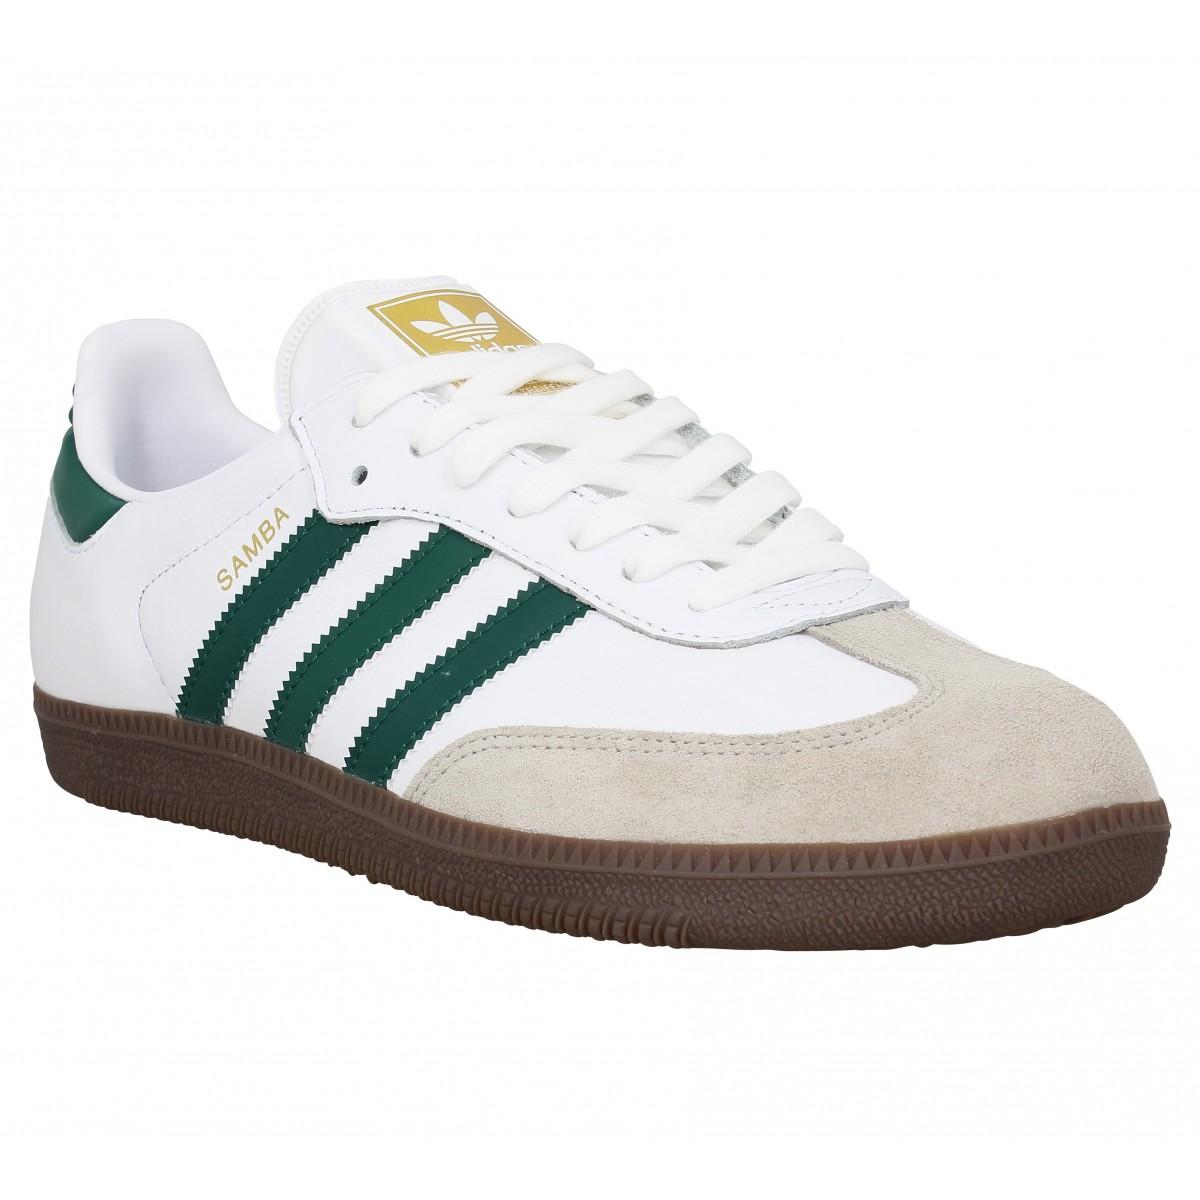 Adidas Homme Samba Og Cuir -40-blanc